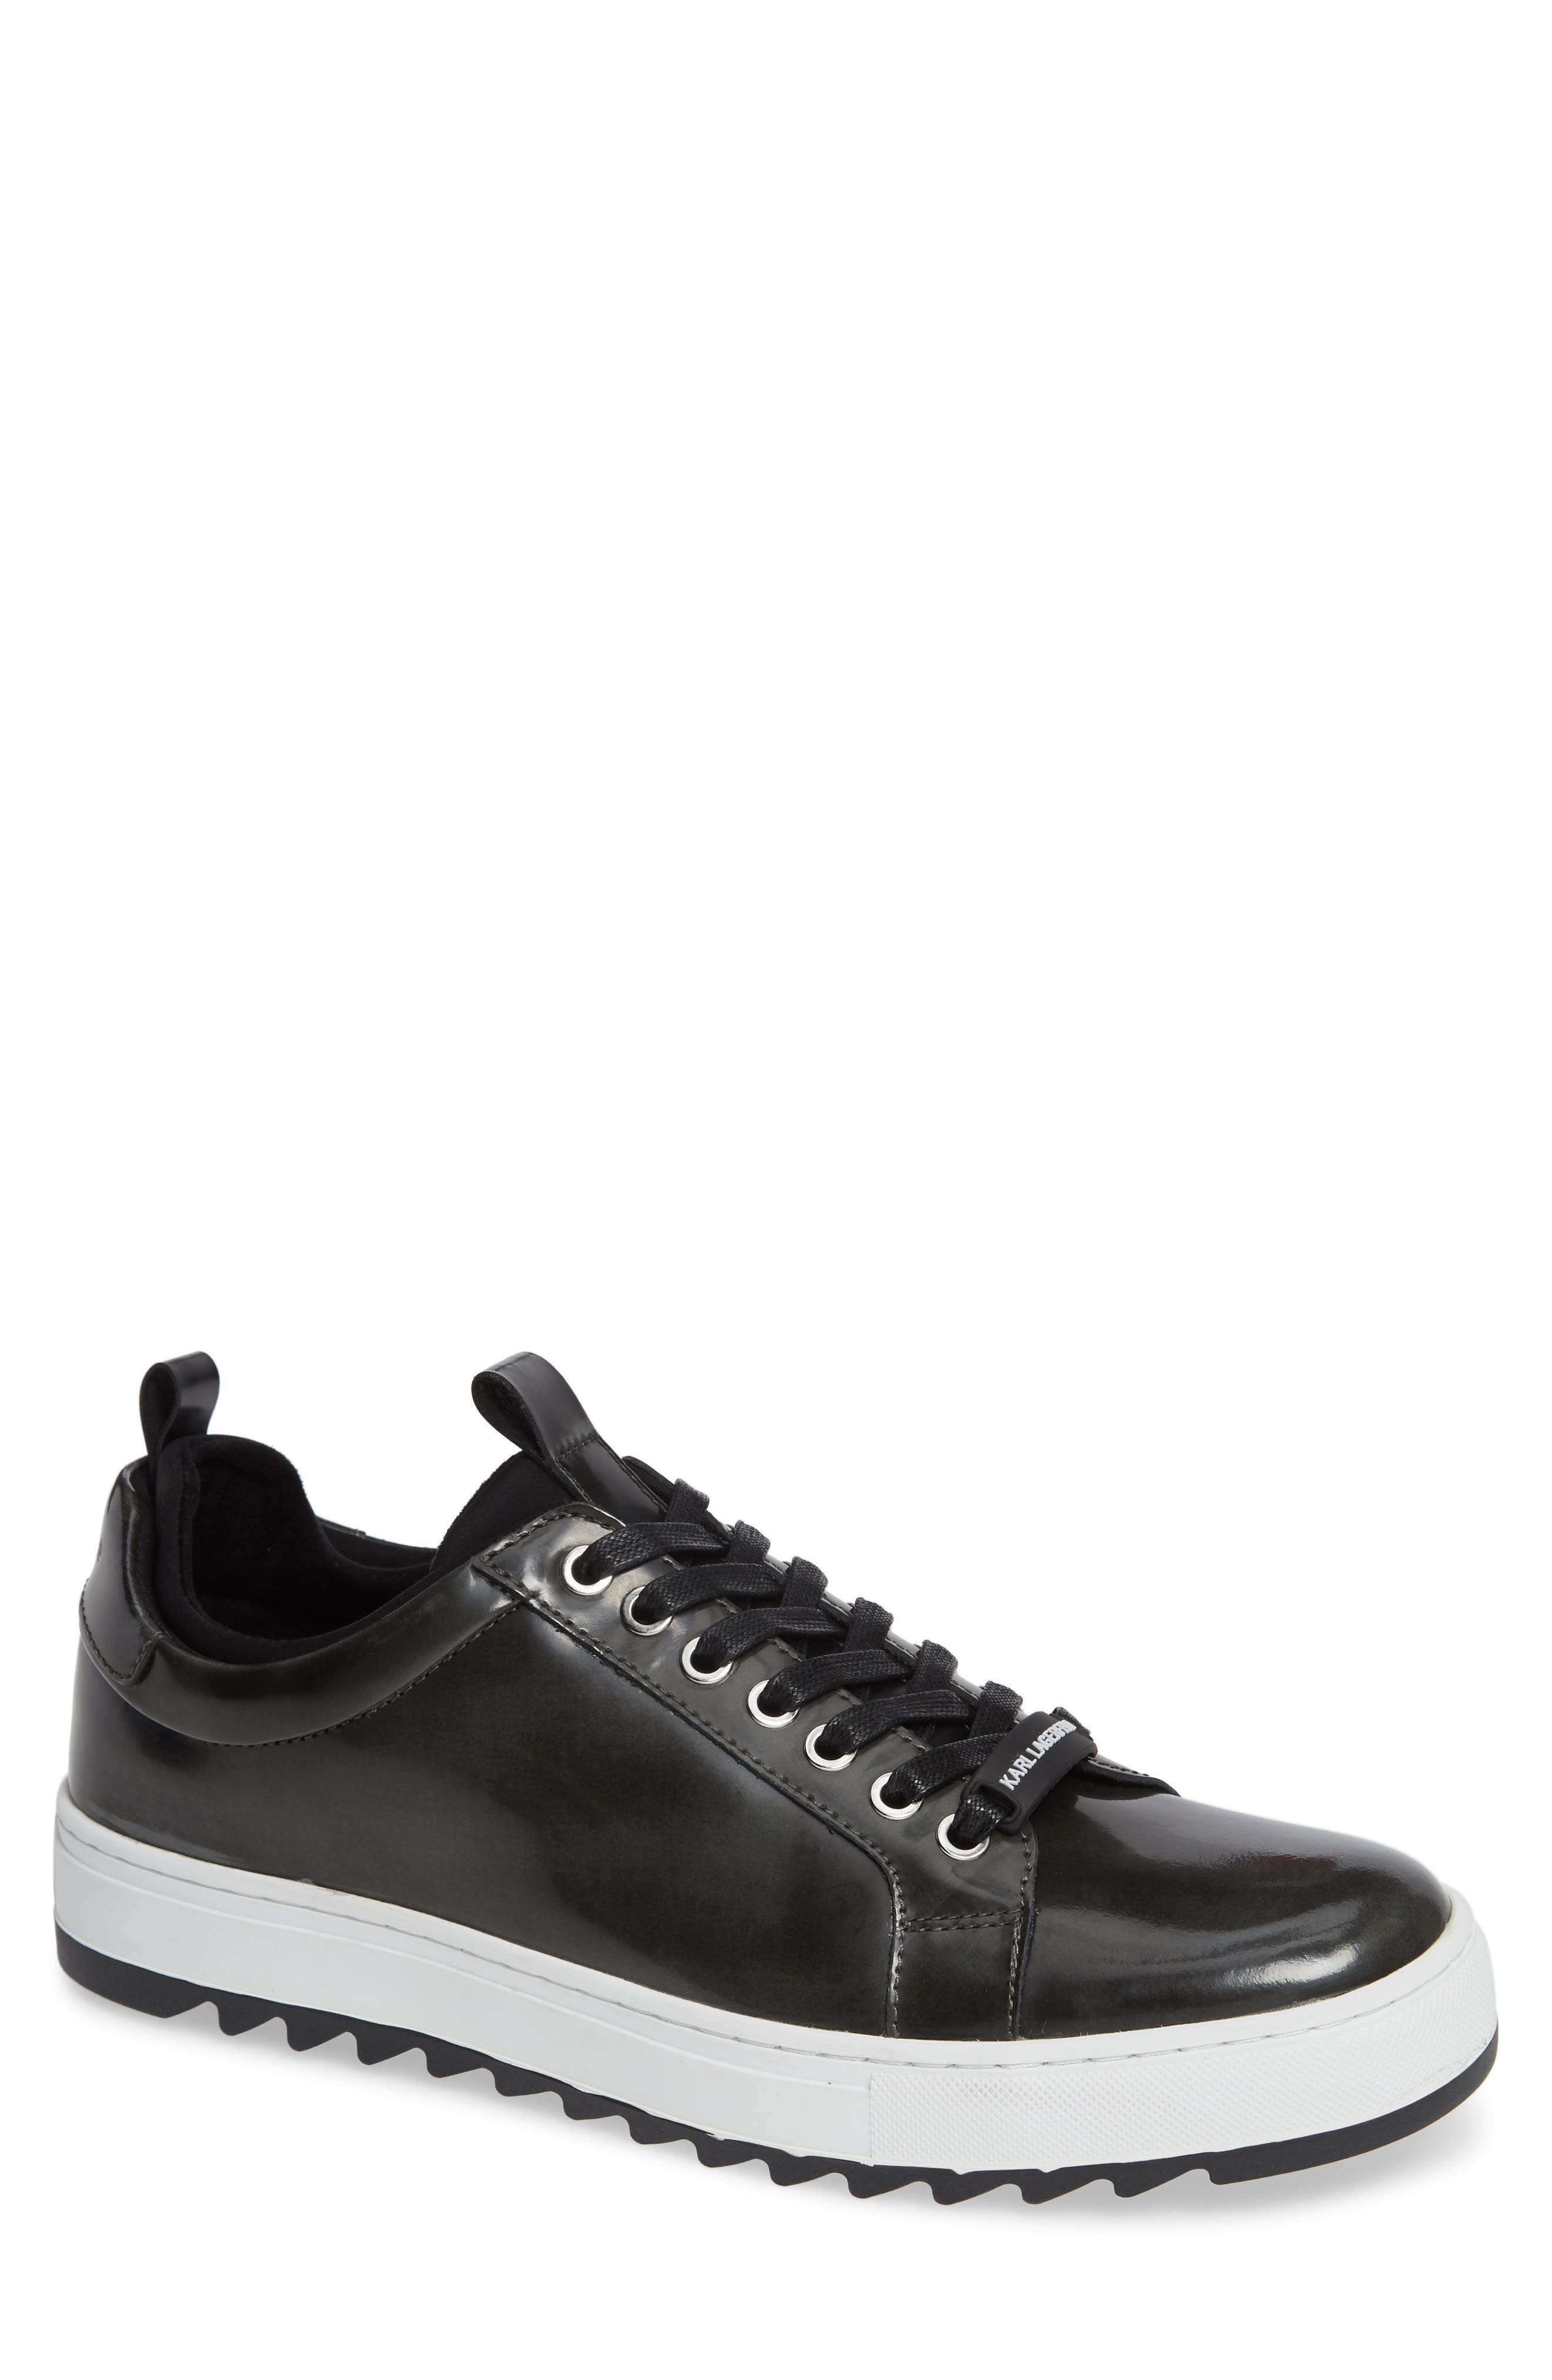 Box Inner Sock Sneaker,                         Main,                         color, DARK GREY